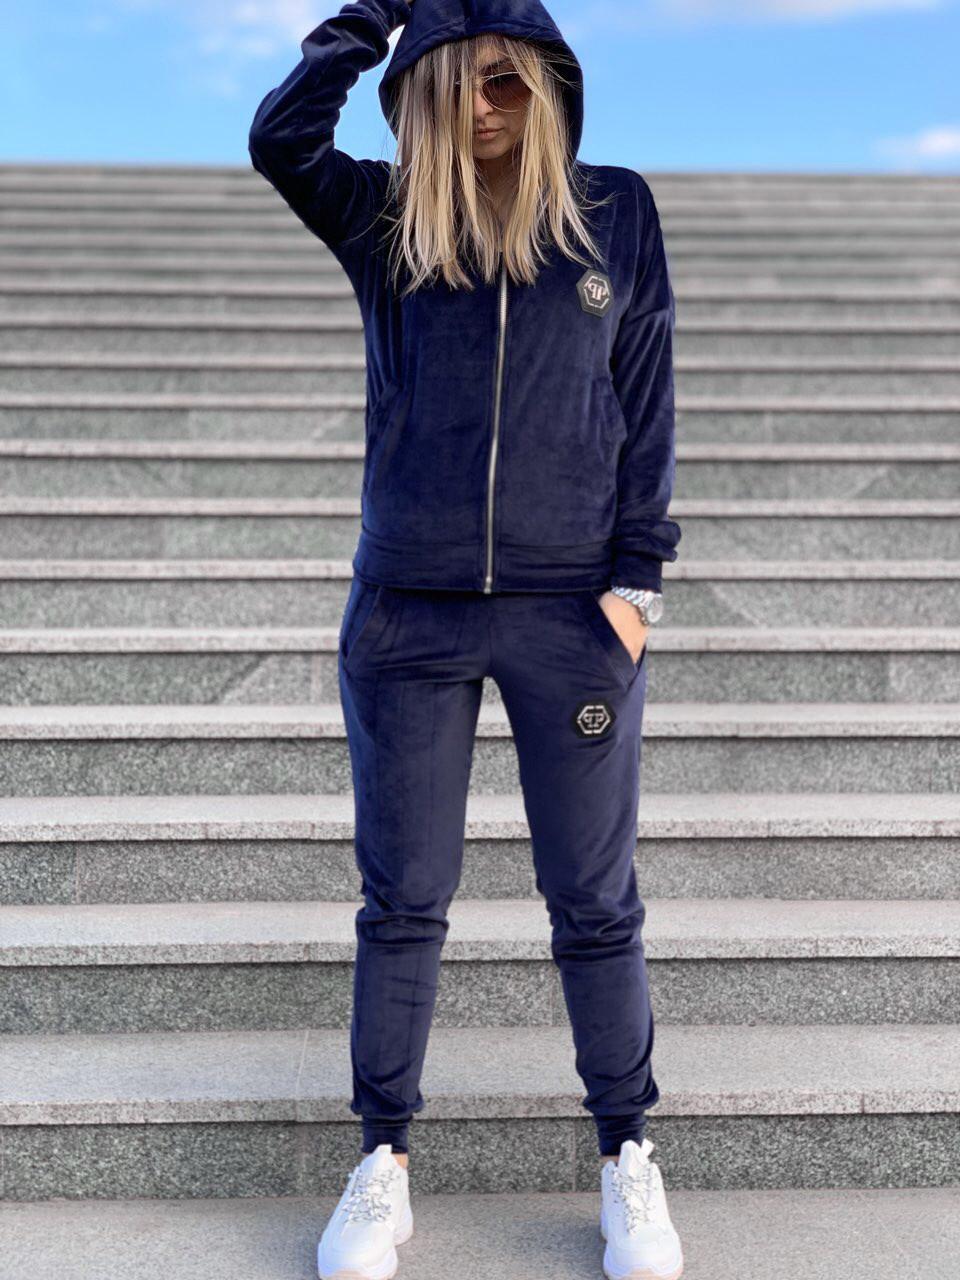 Спортивный костюм жеснкий Philipp Plein D6330 велюровый темно-синий